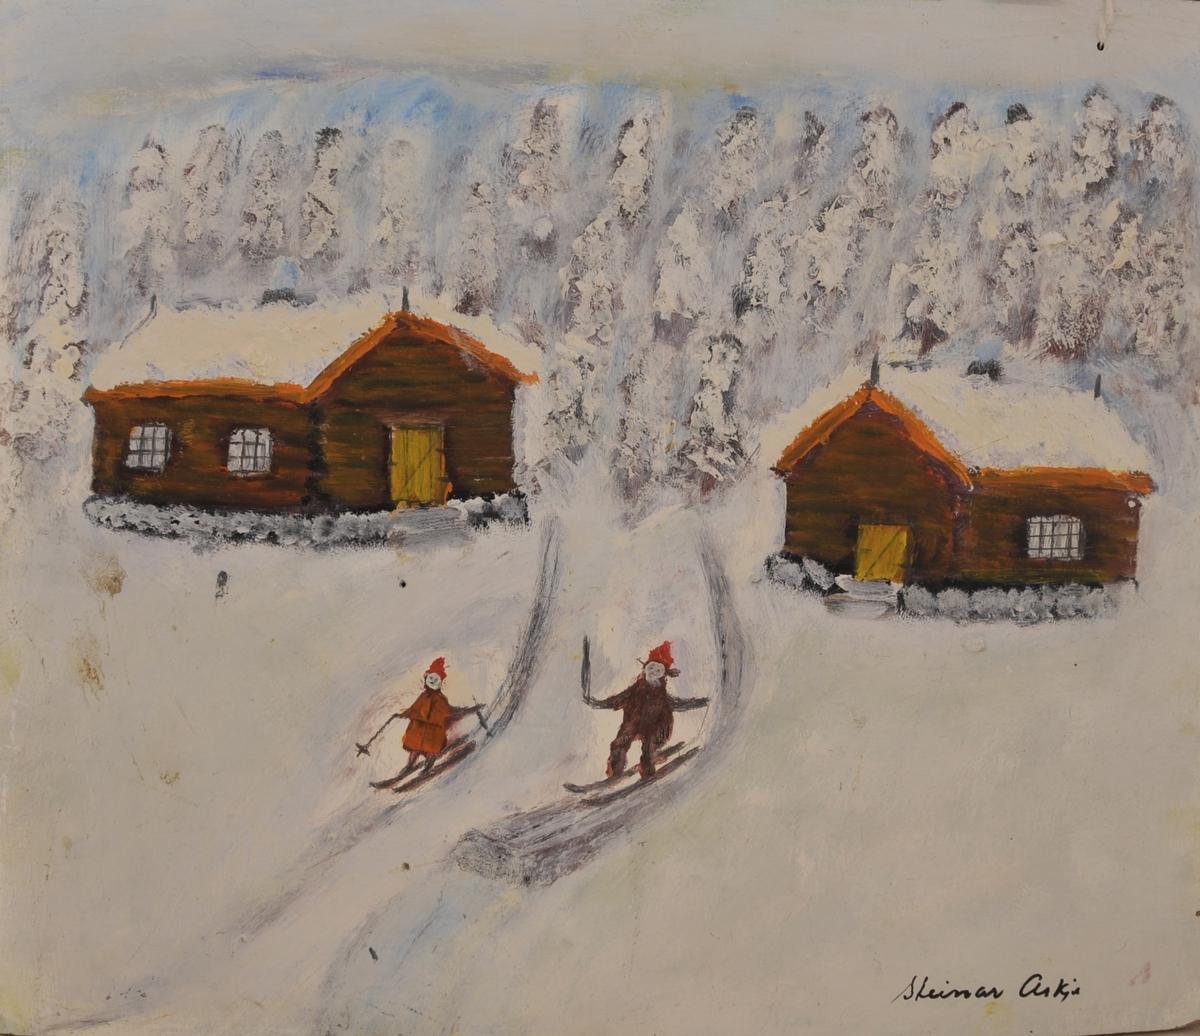 Vinterlandskap, to tømmerhus, to personar som renner på ski.